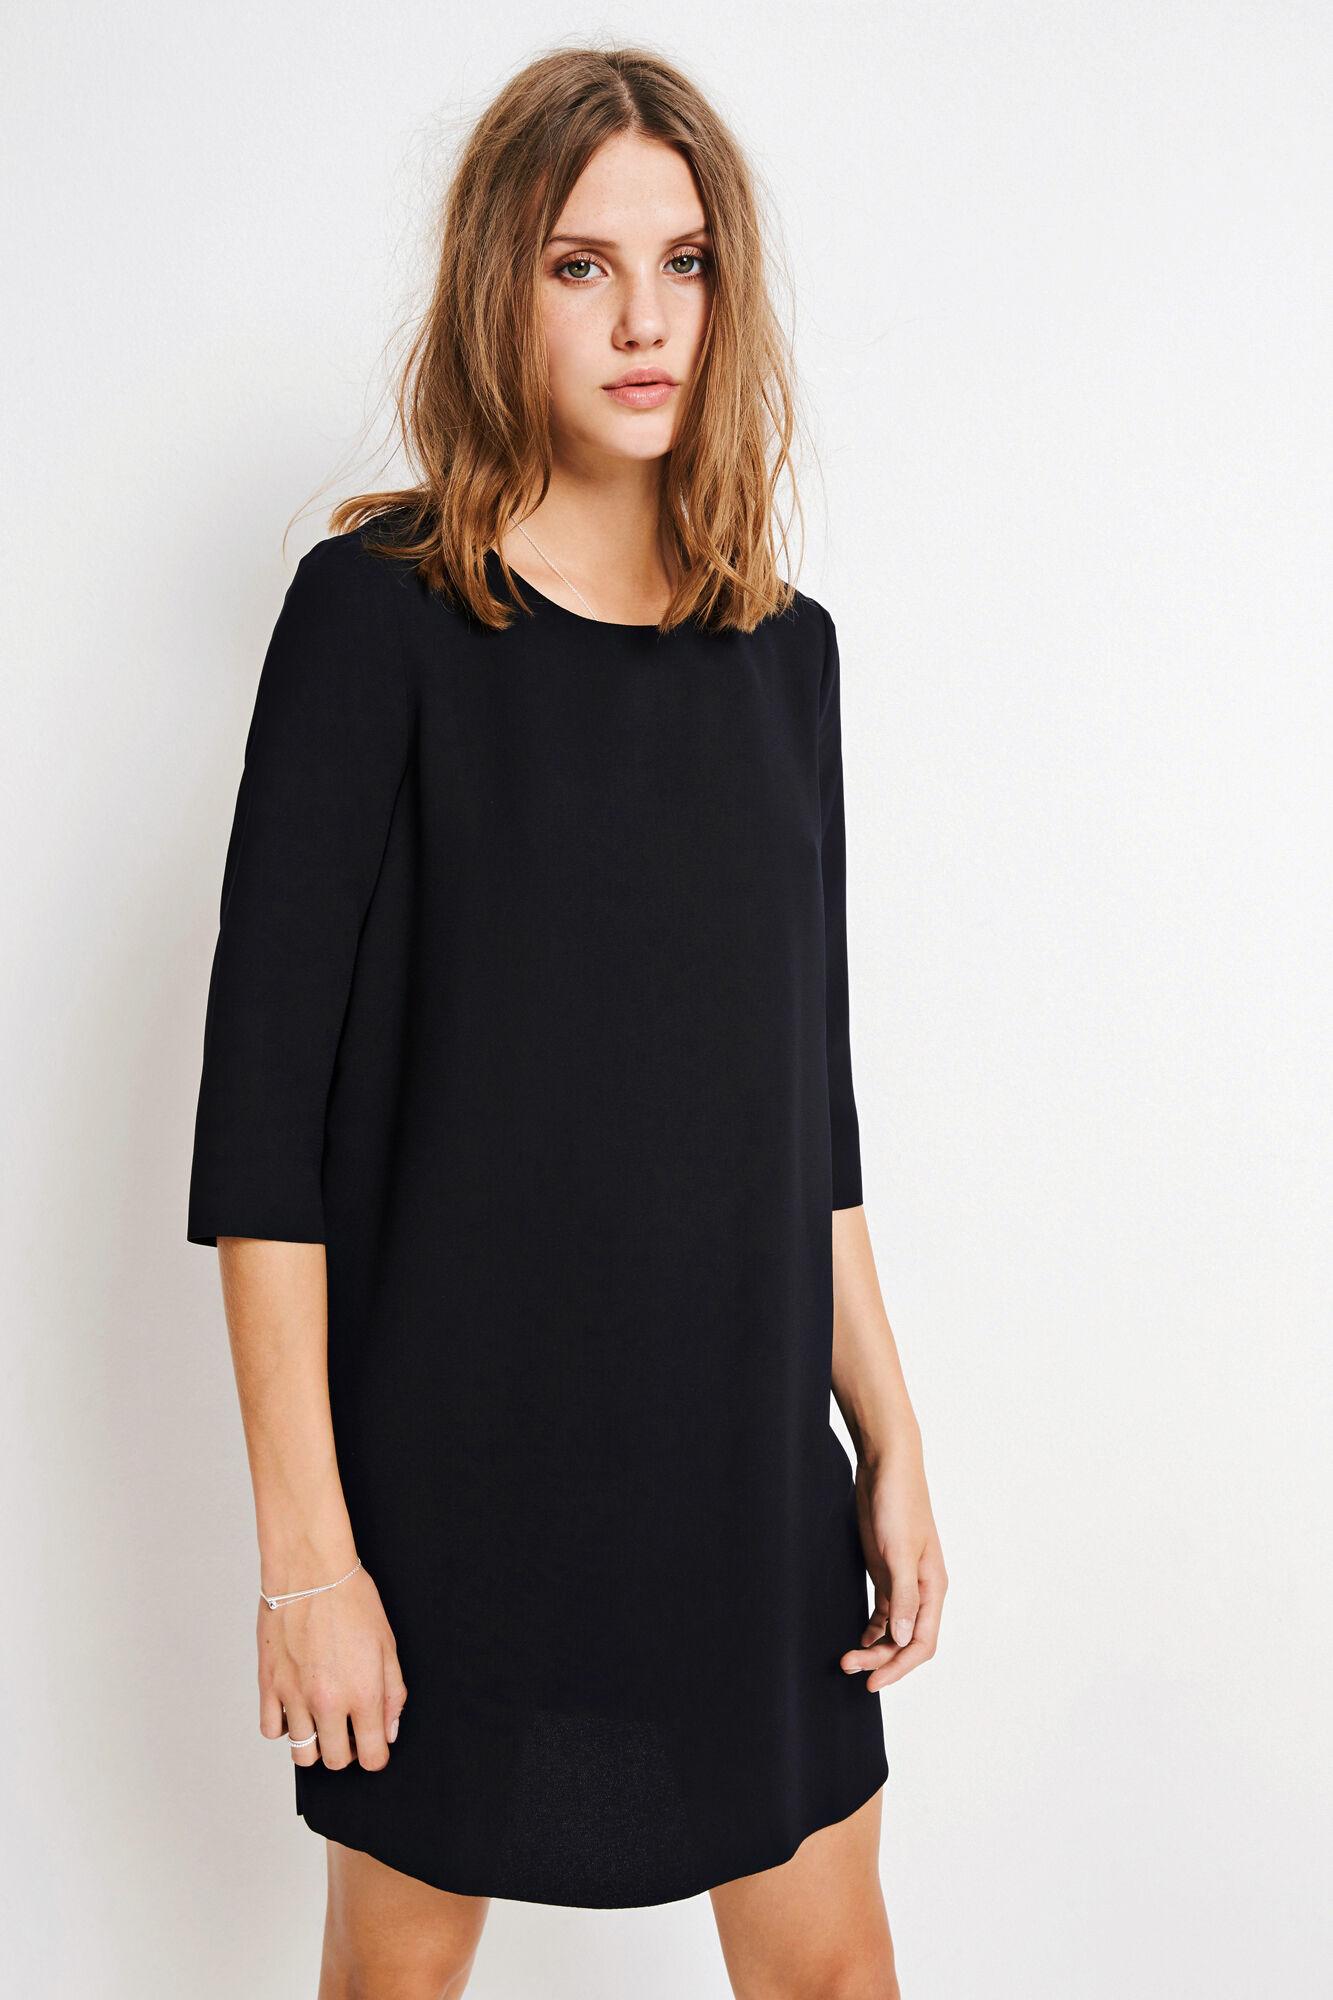 CAPRI DRESS 6296